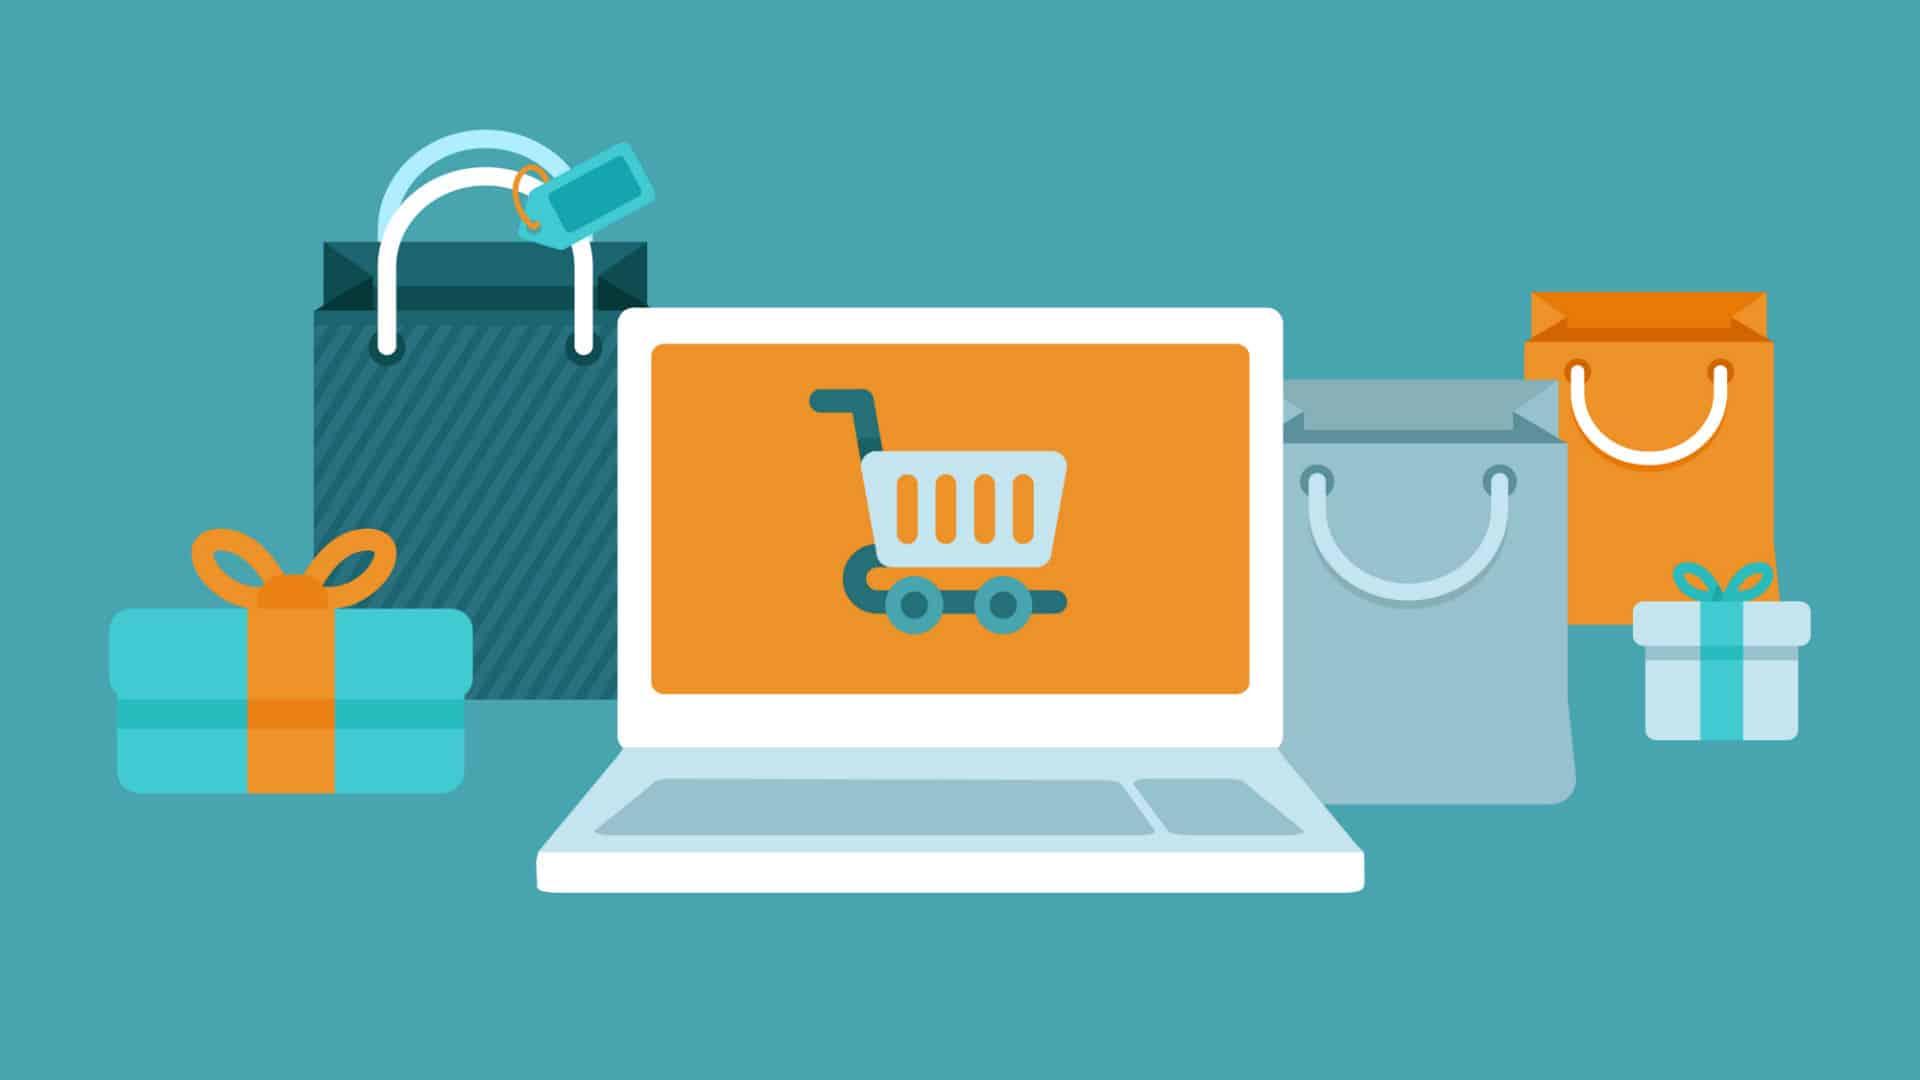 seo-e-commerce-misvattingen